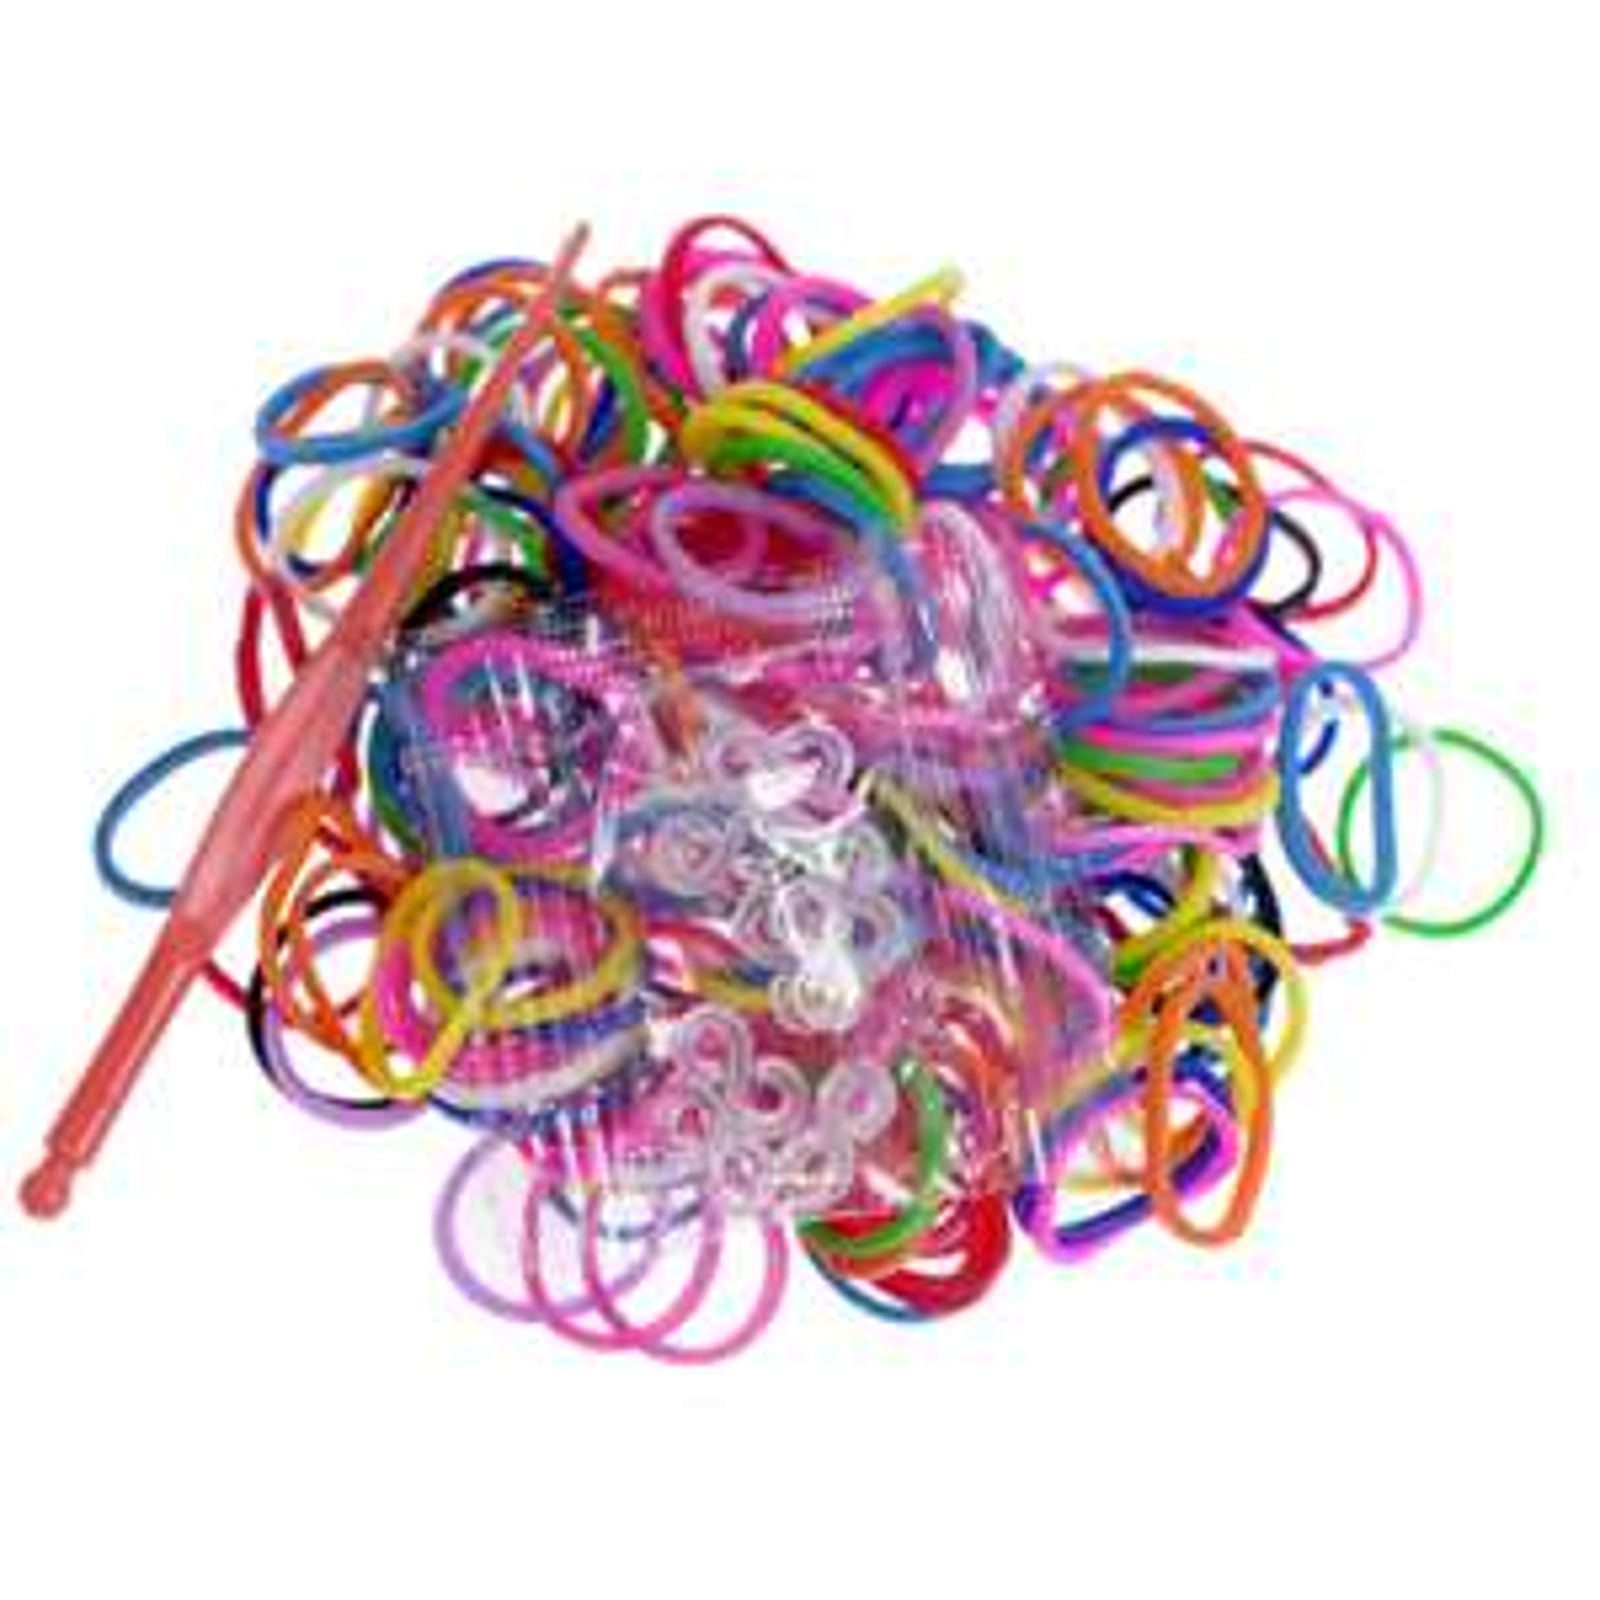 200 élastiques Colorful loom bands, couleurs assorties